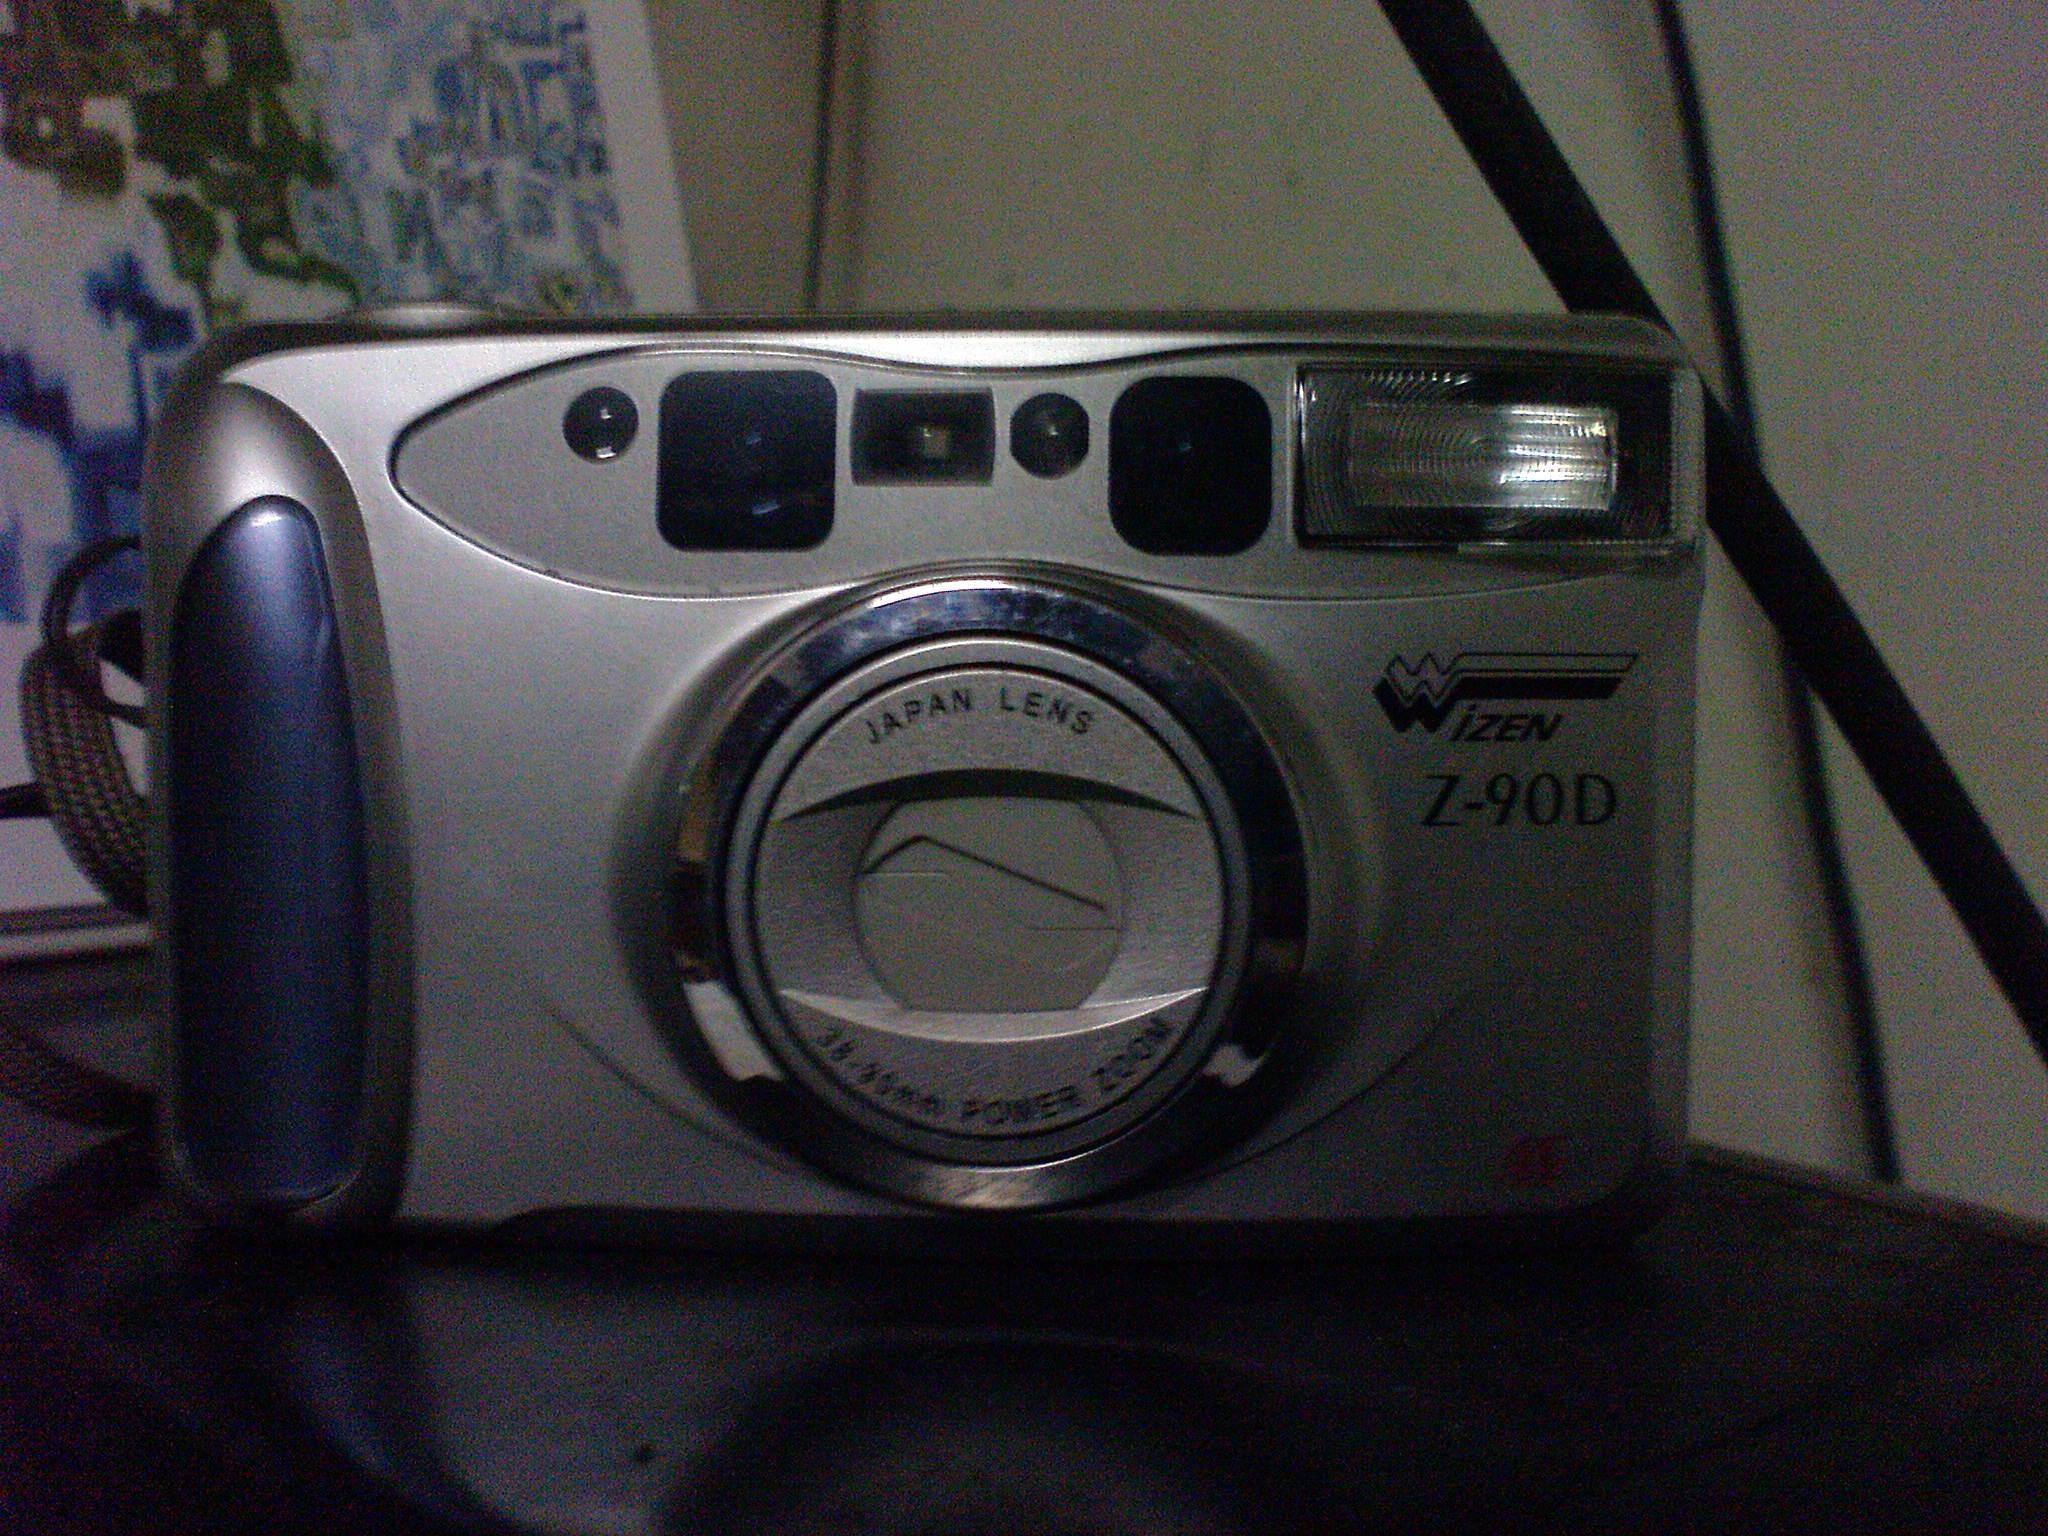 wizen z-90D | ClickBD large image 0